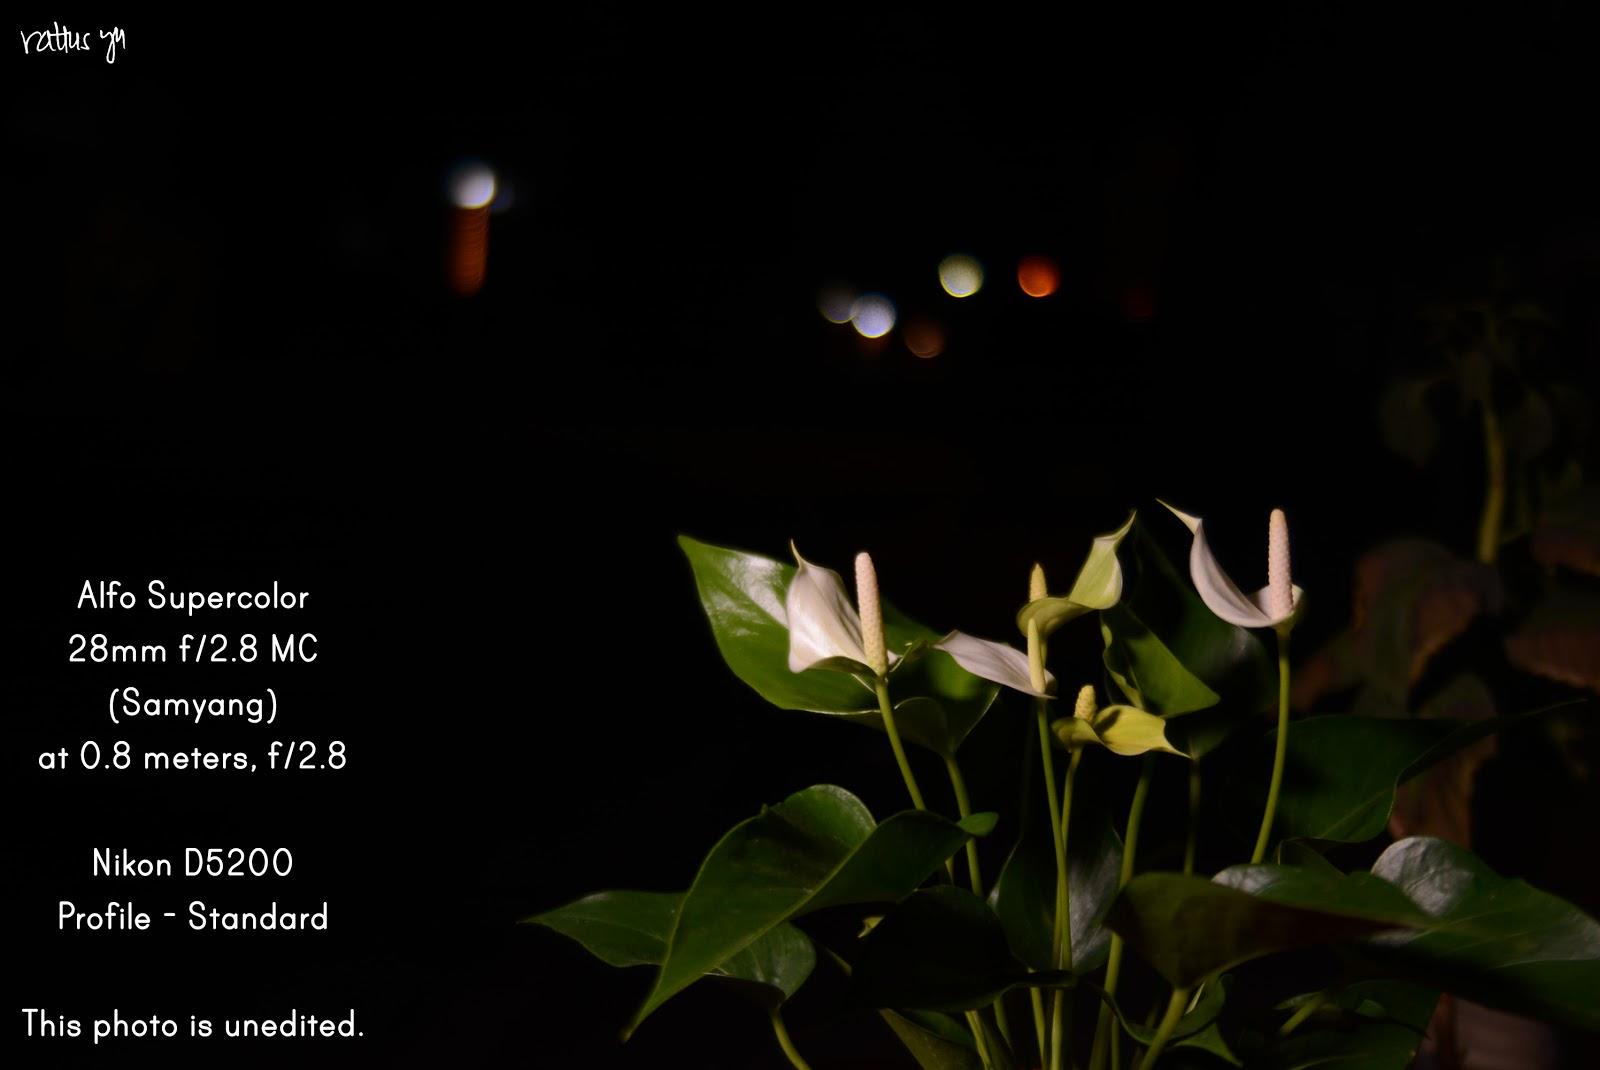 LENS LOVE: Alfo Supercolor 28mm f/2 8 MC (Samyang) | Lens